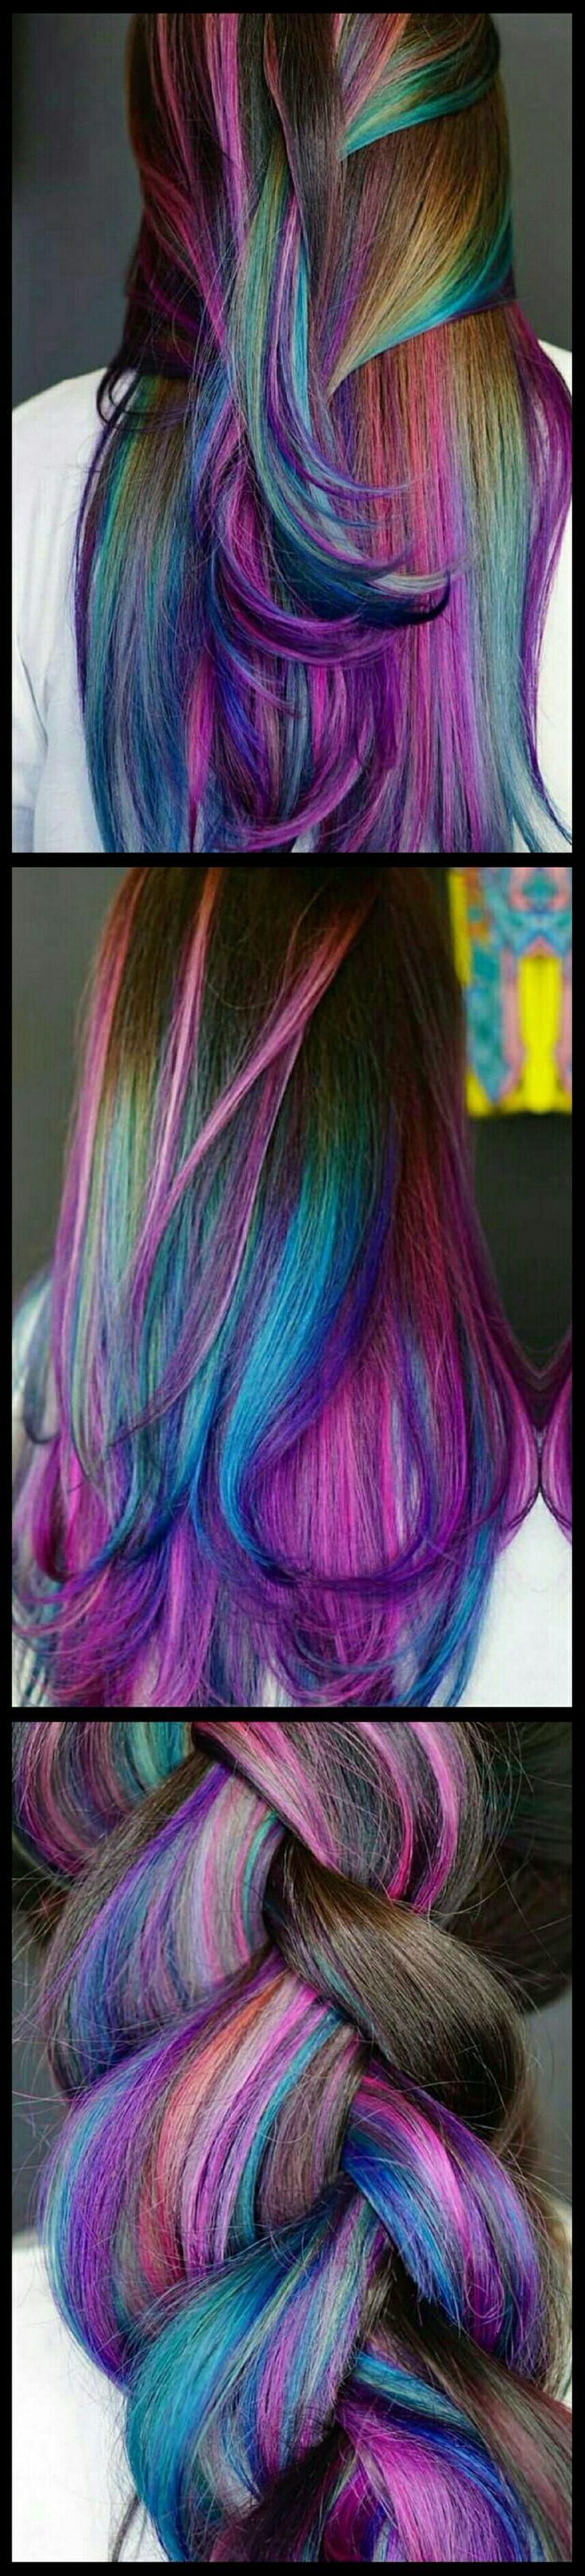 334 best Hair Inspiration images on Pinterest